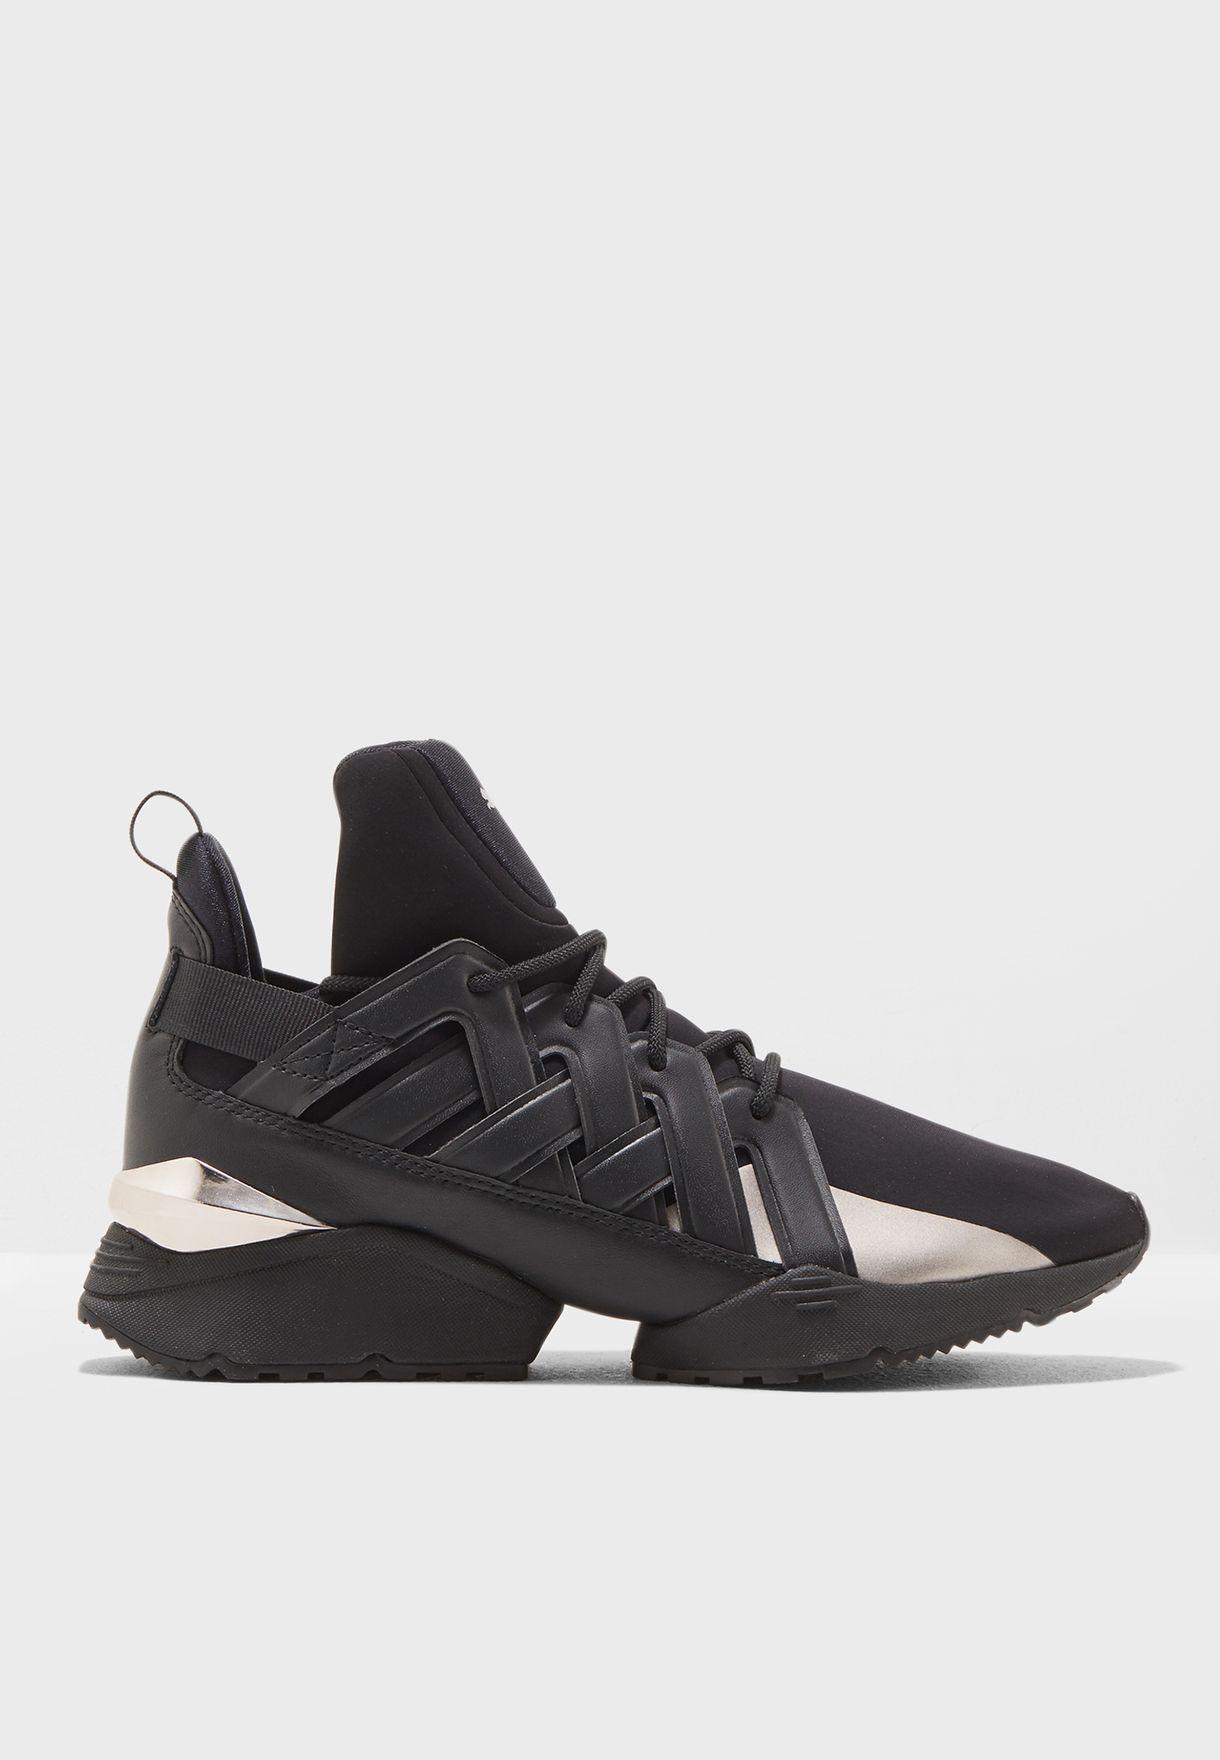 d23a59b1e تسوق حذاء موس ايكو ماركة بوما لون أسود 36644703 في الامارات ...